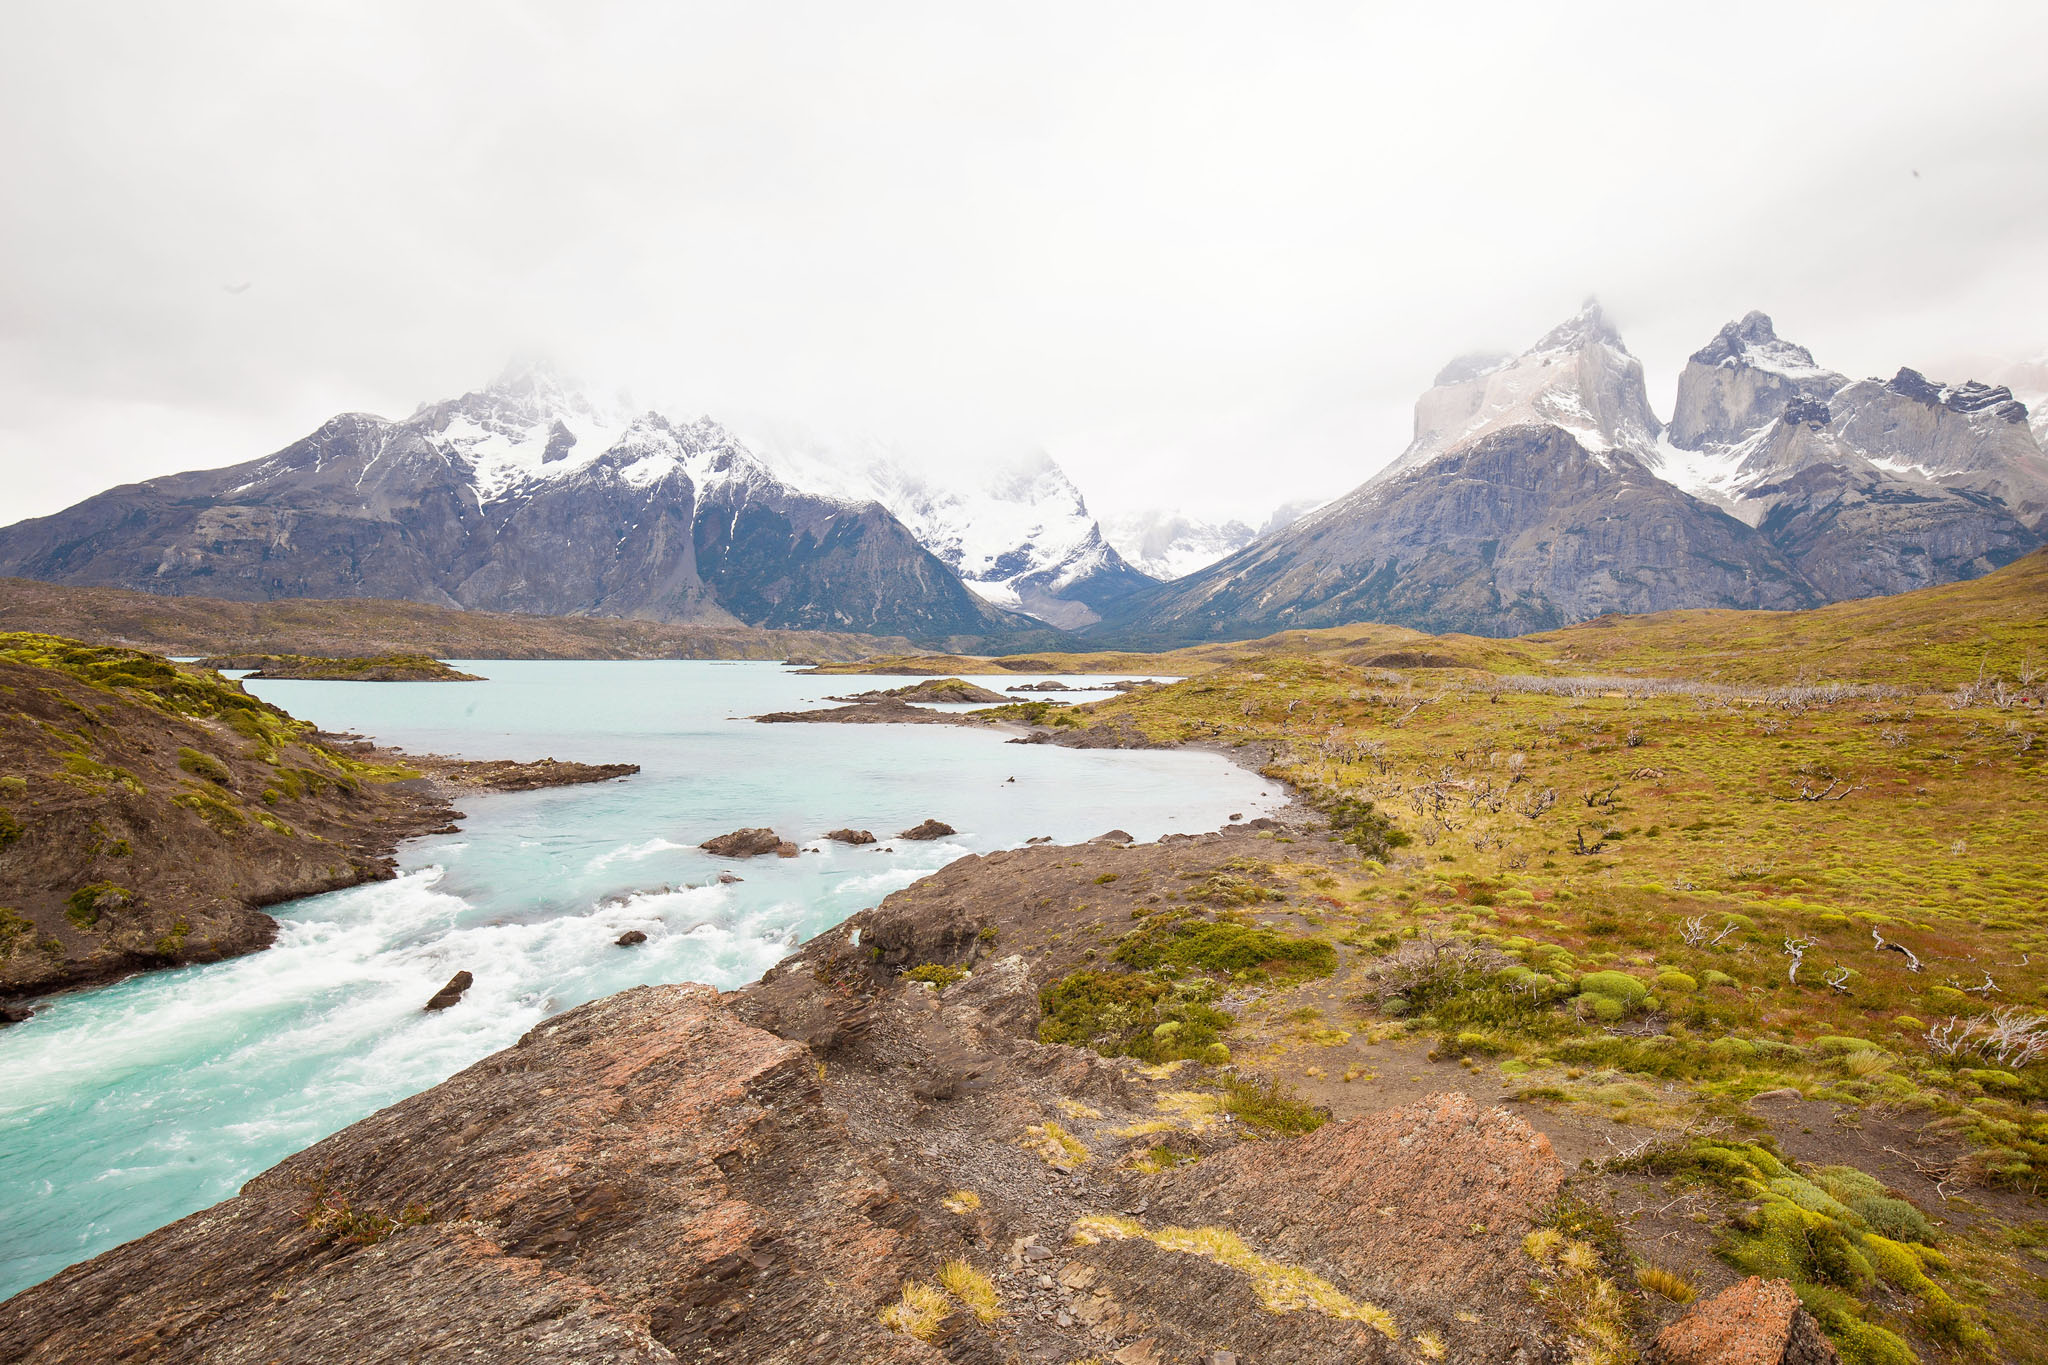 Wedding-Travellers-Overlanding-Destination-Wedding-Chile-Torres-del-Paine-turquoise-river-los-cuernos